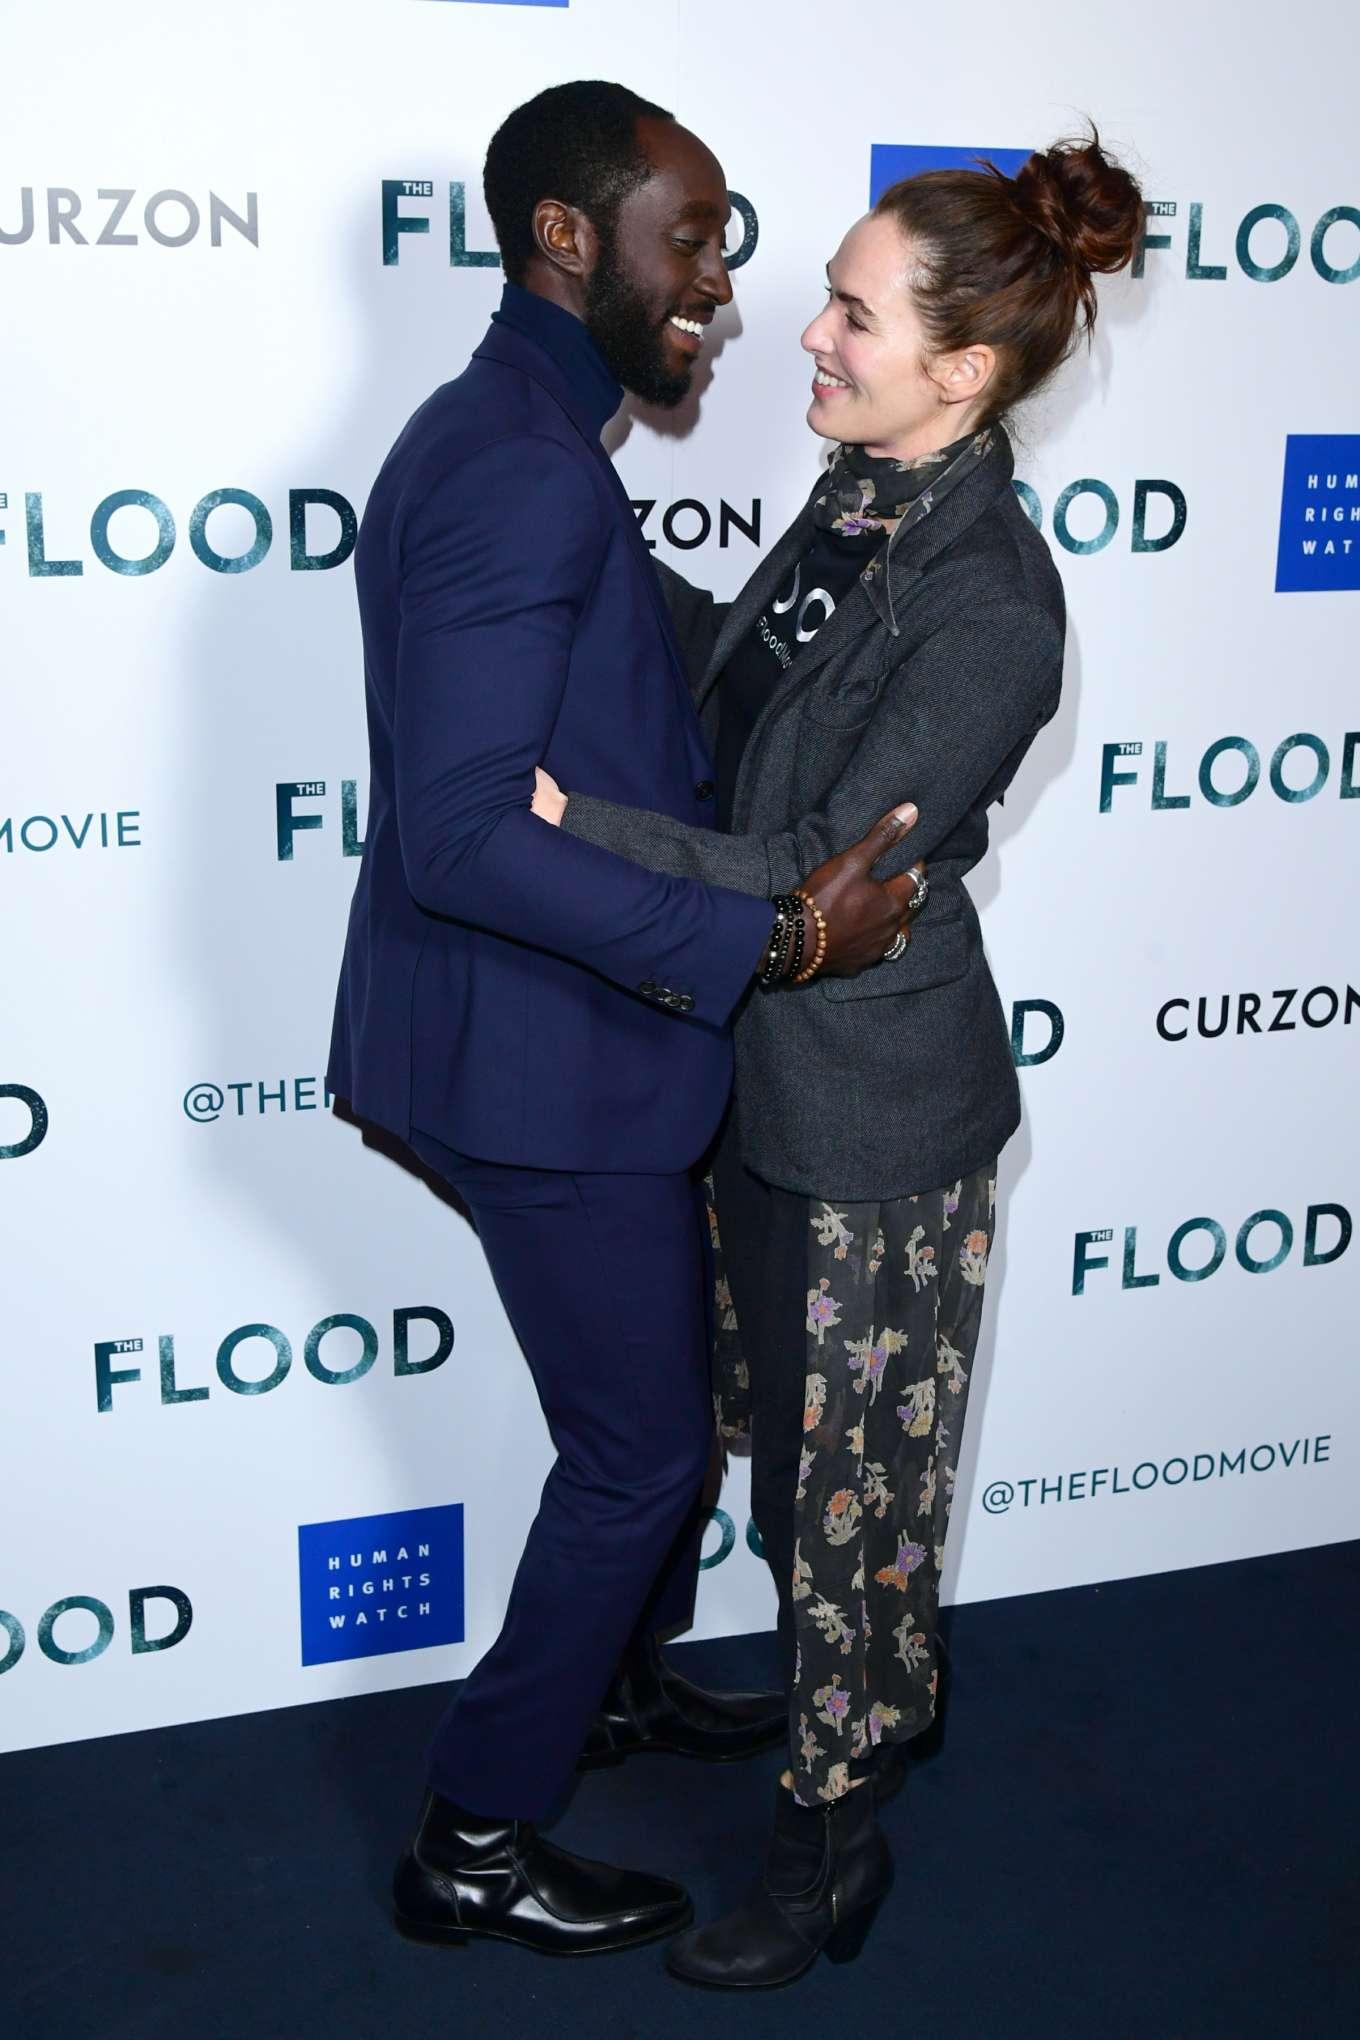 Lena Headey 2019 : Lena Headey: The Flood Screening in London-04